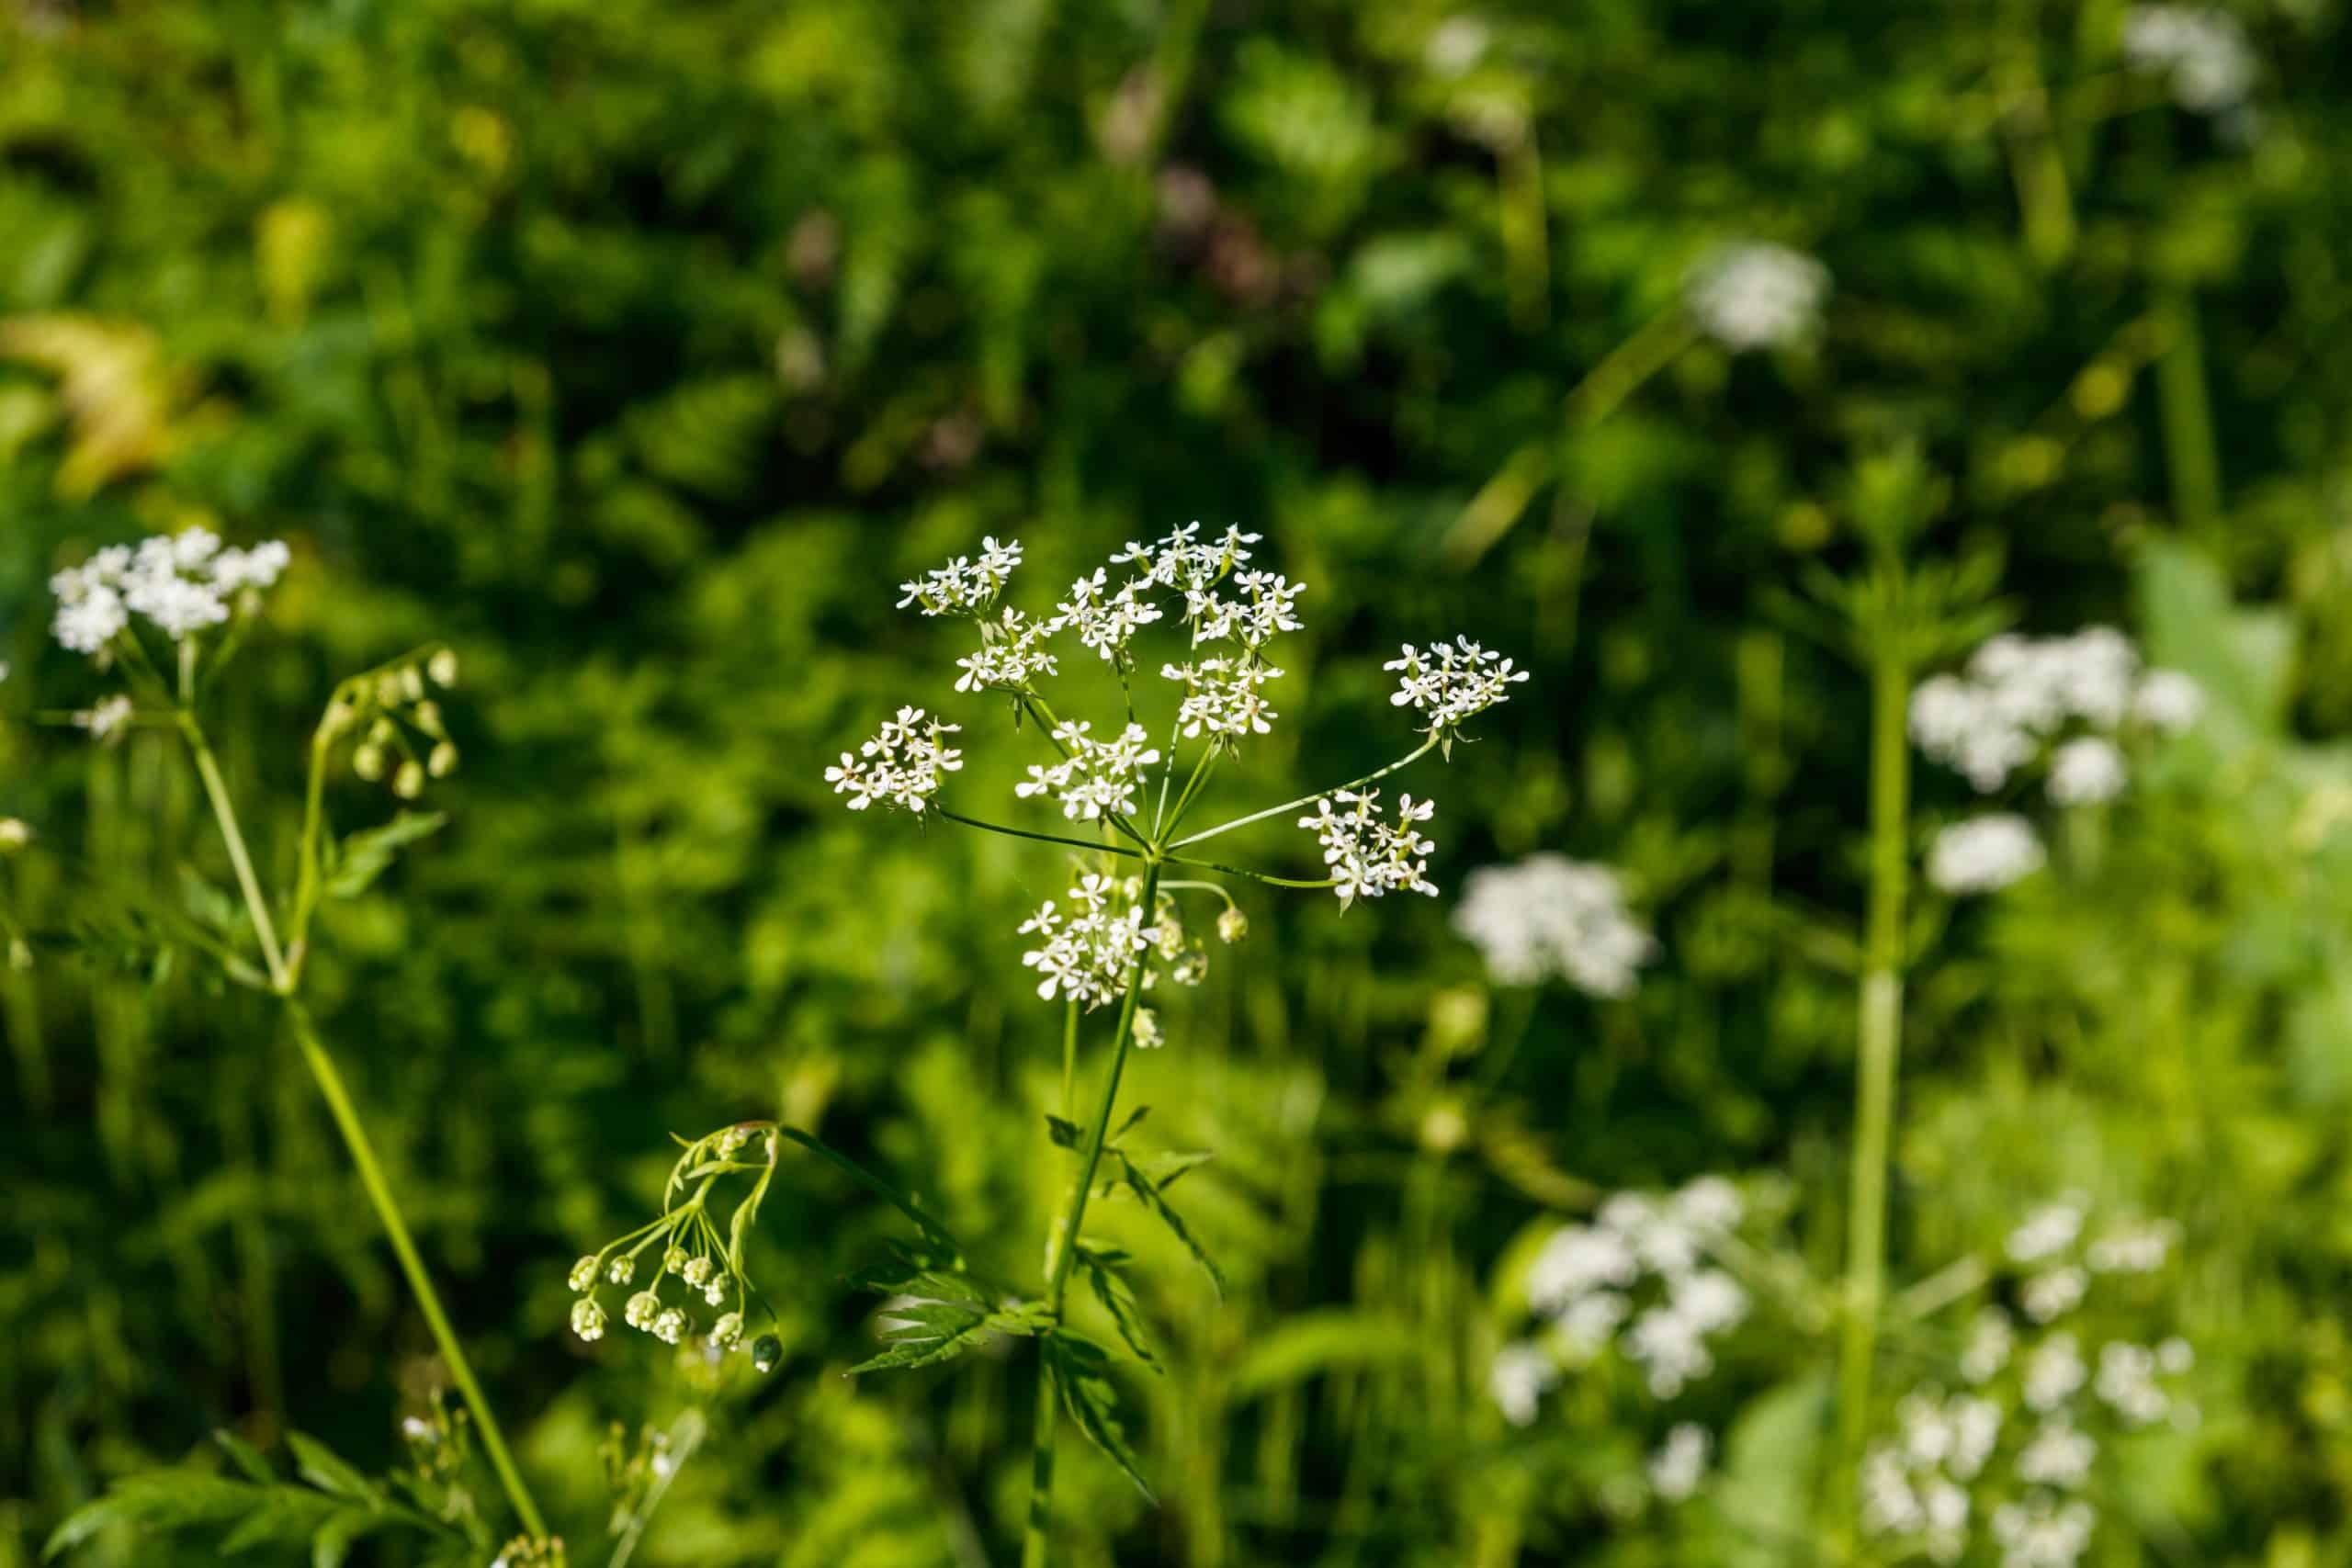 Water hemlock (Conium maculatum) flowers